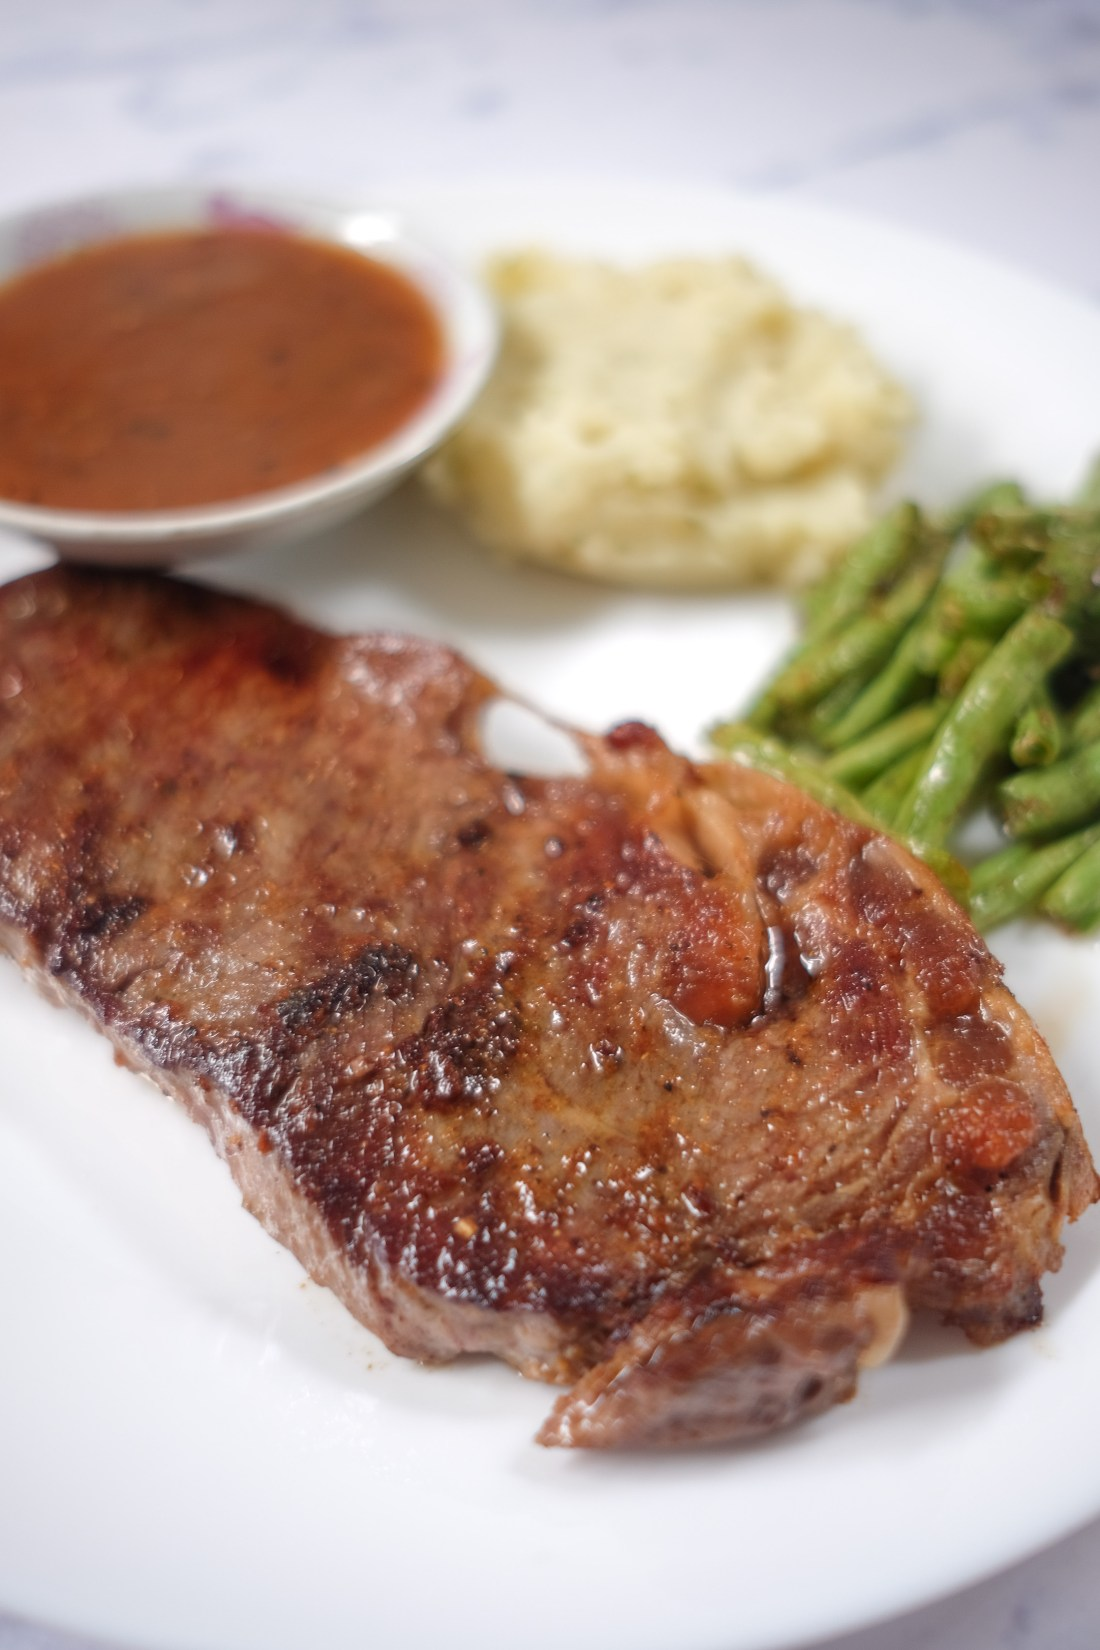 Steak at Home